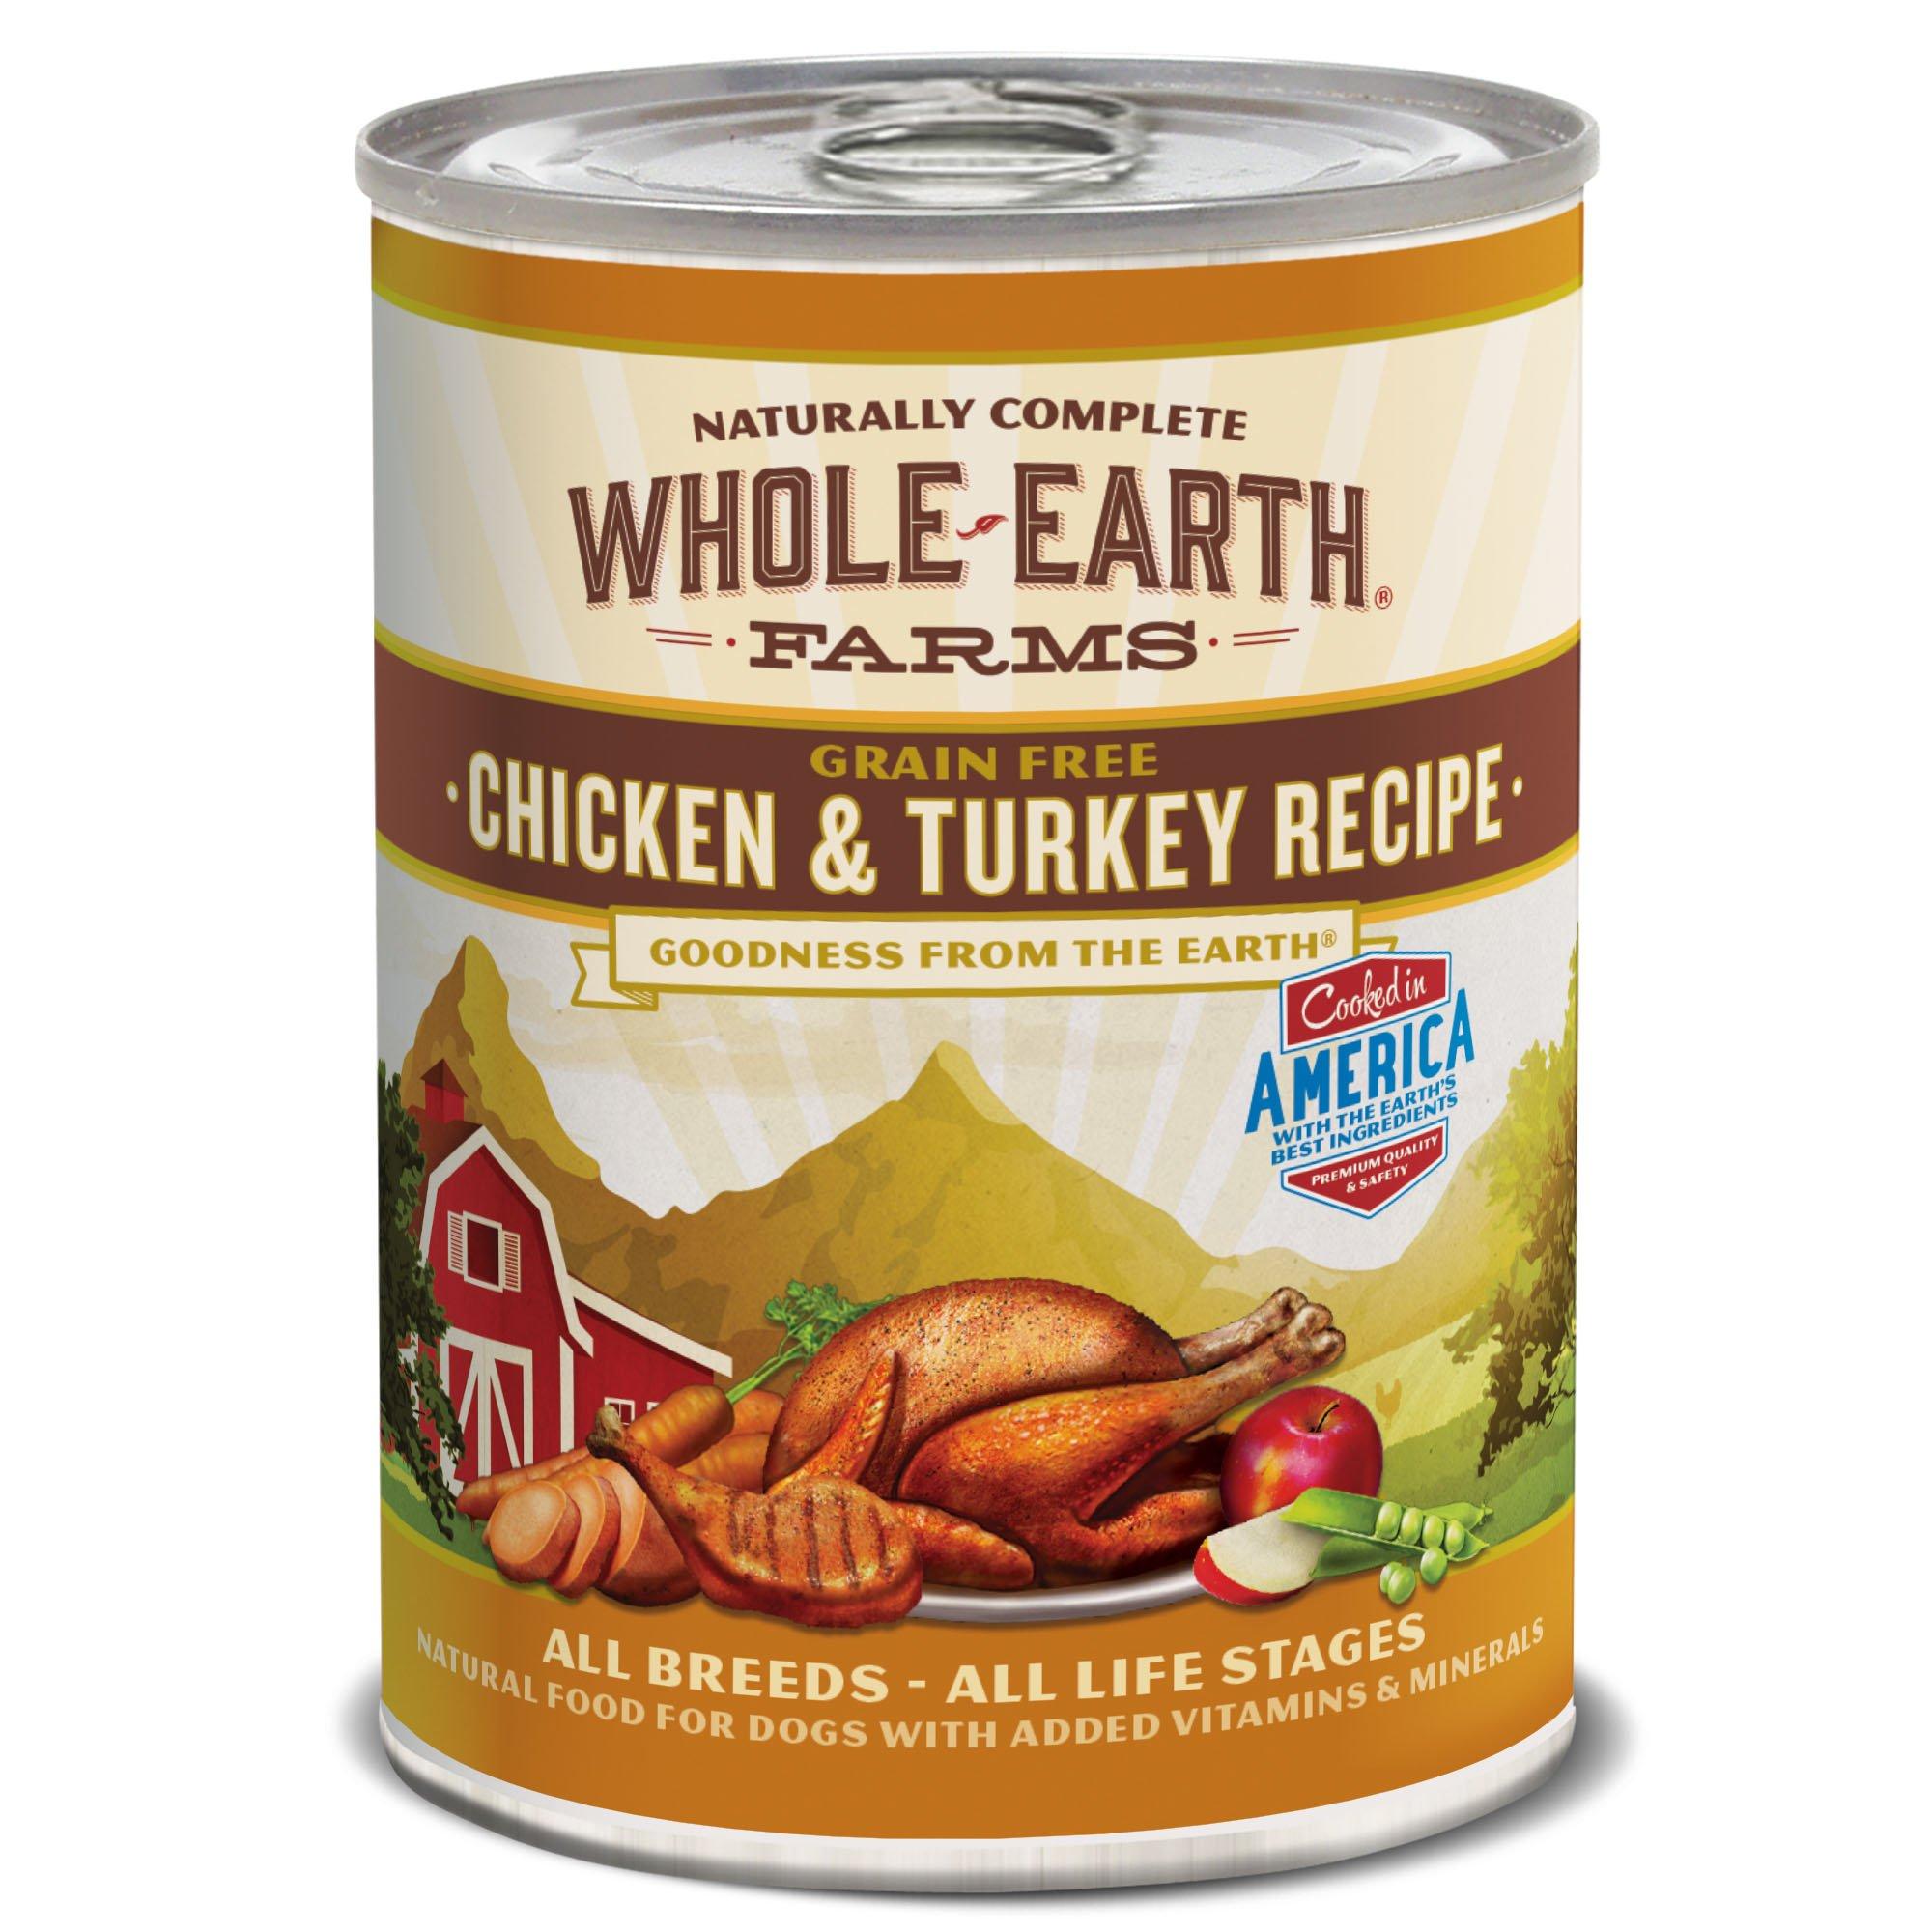 Merrick Whole Earth Farms Grain Free Canned Dog Food, 12.7 oz, 12 Count